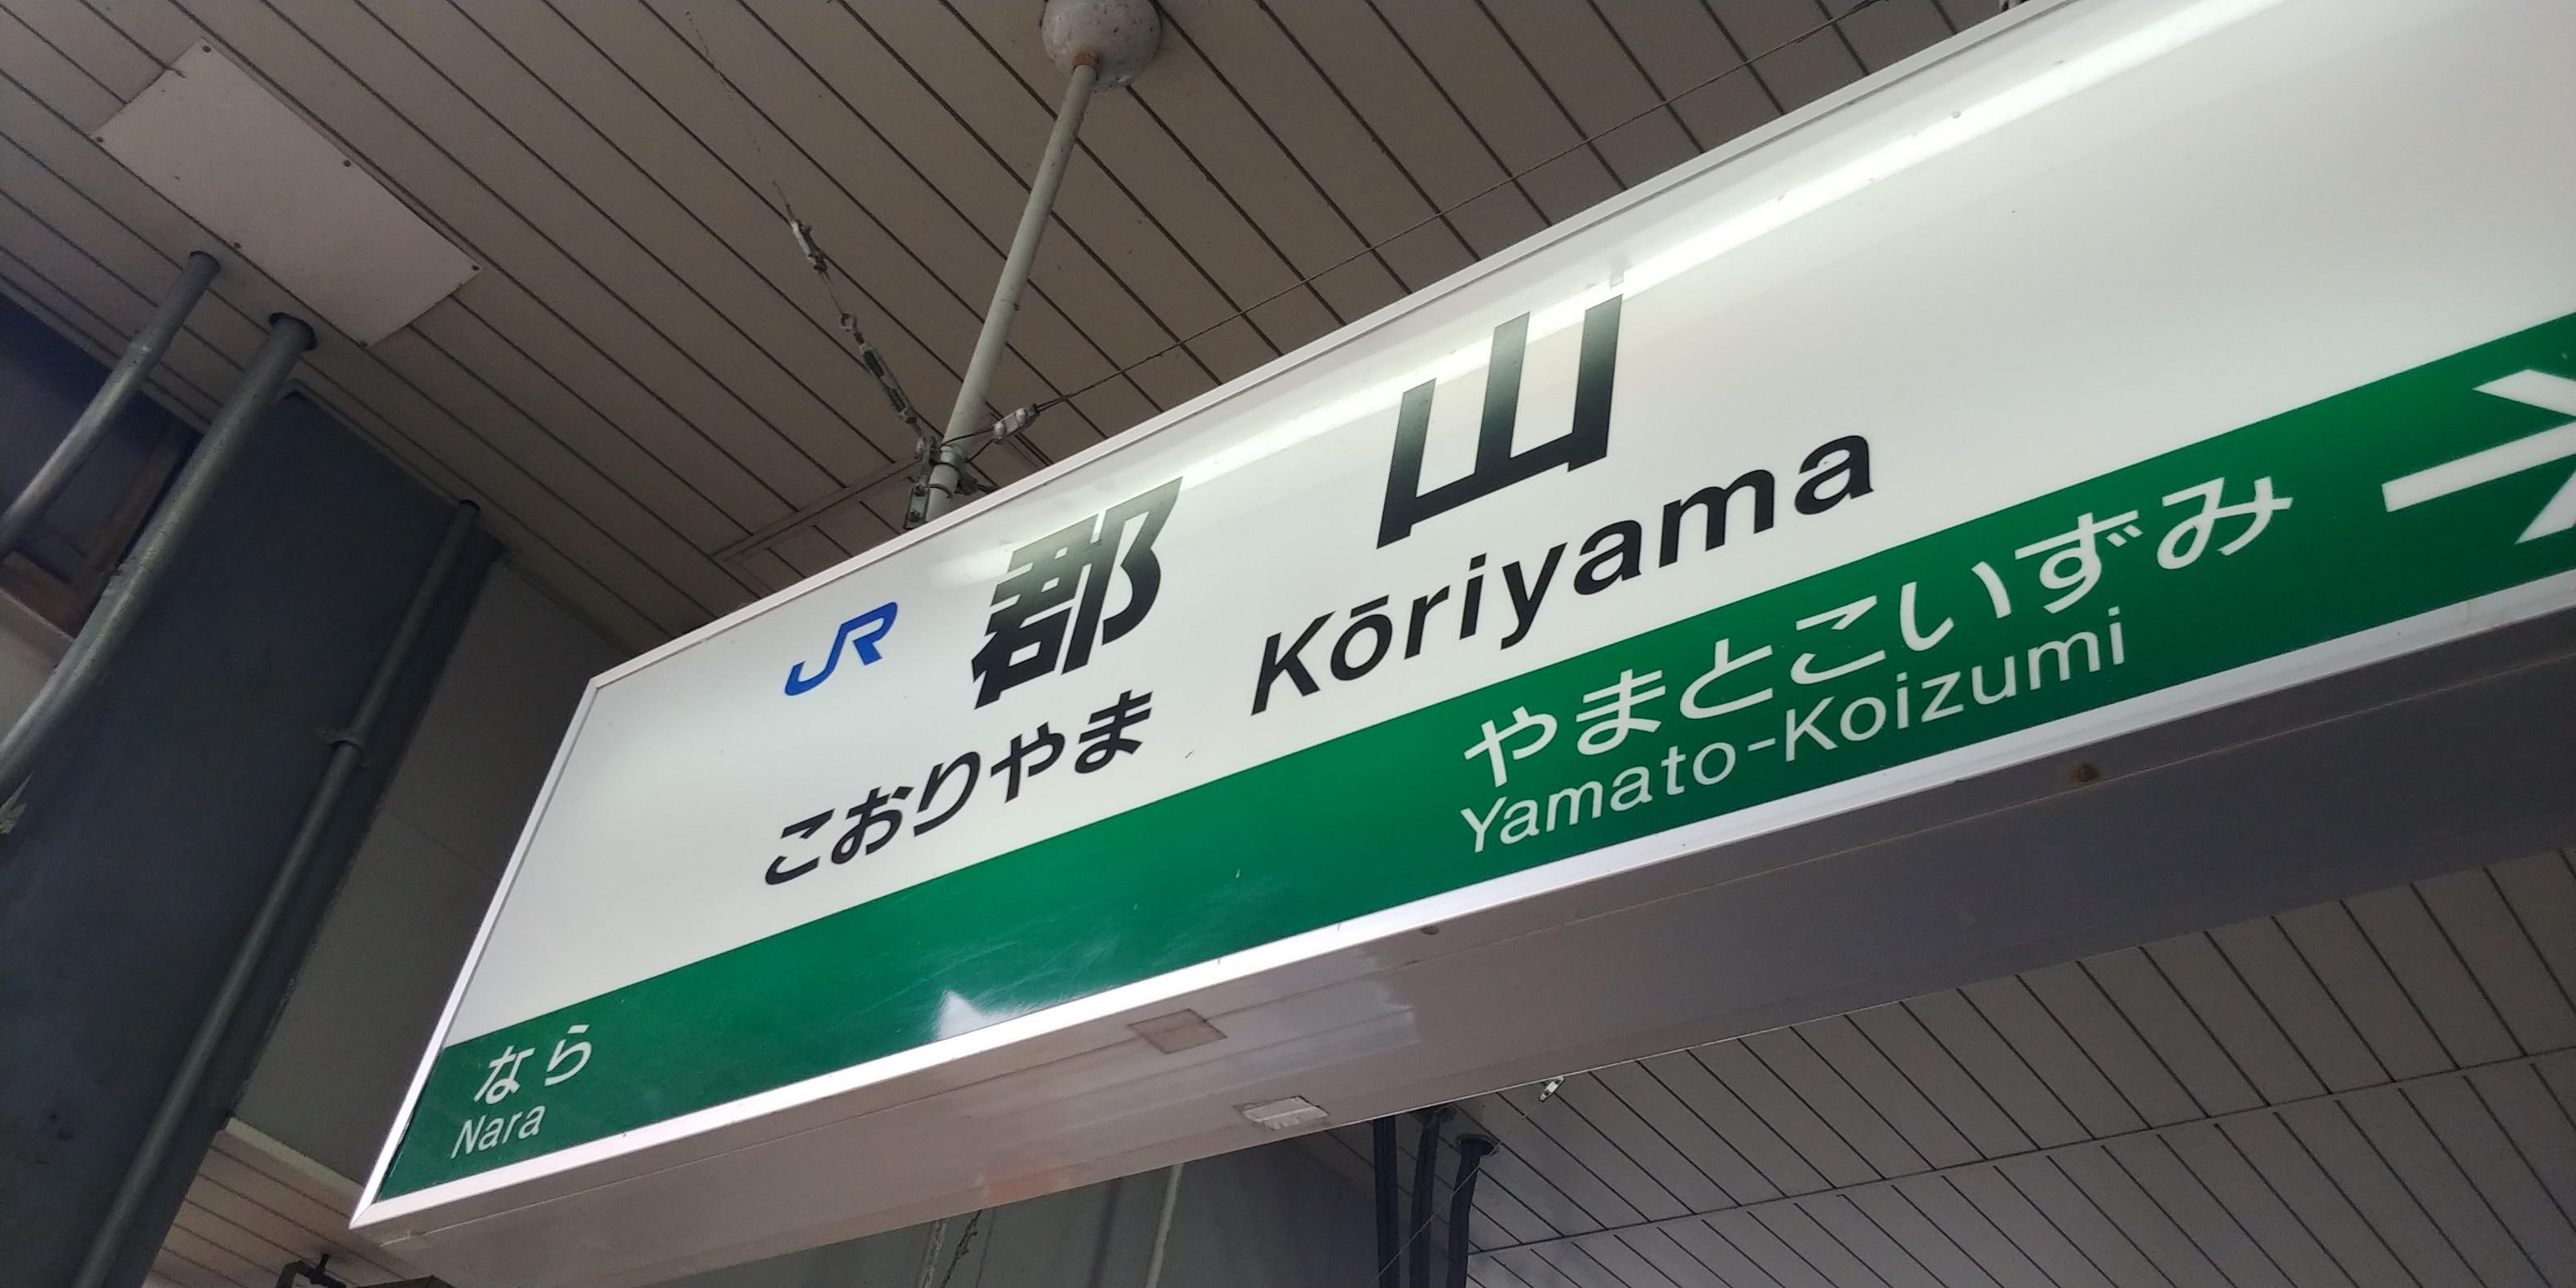 f:id:kishuji-kaisoku:20200212231652j:image